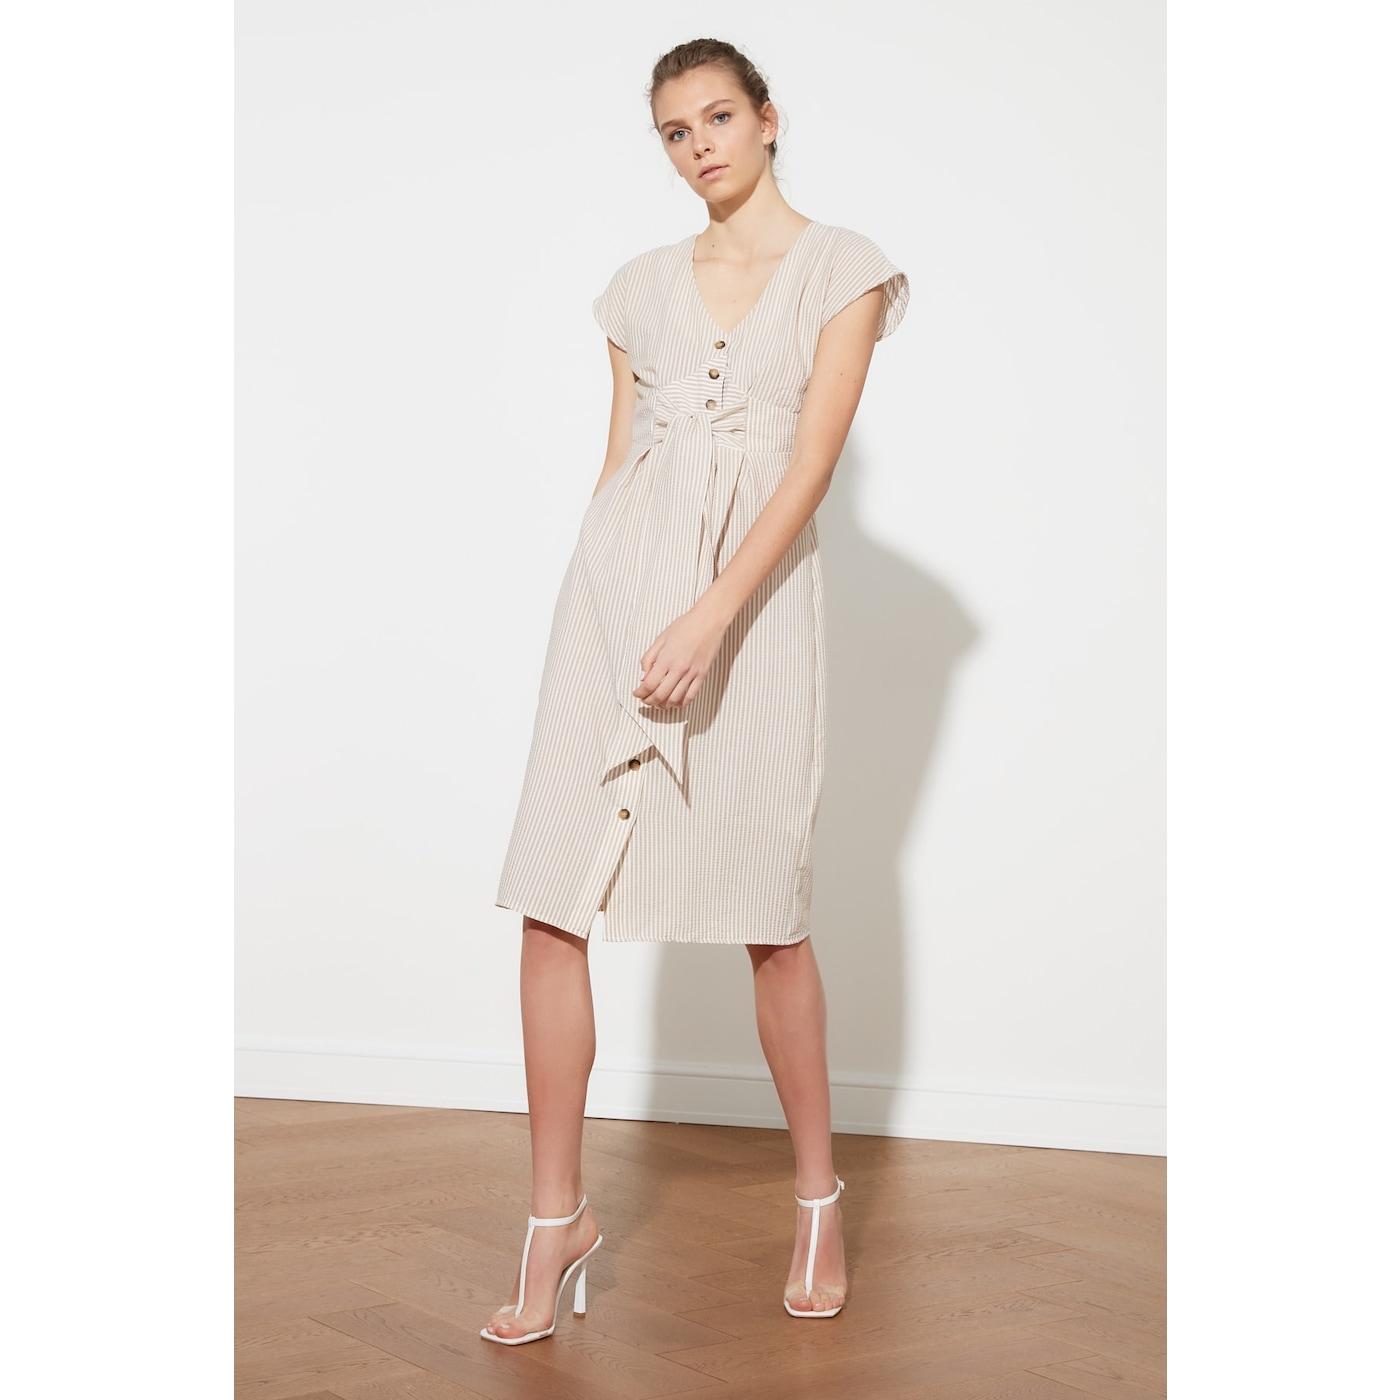 Trendyol Striped Dress with White Tie DetailING dámské 38